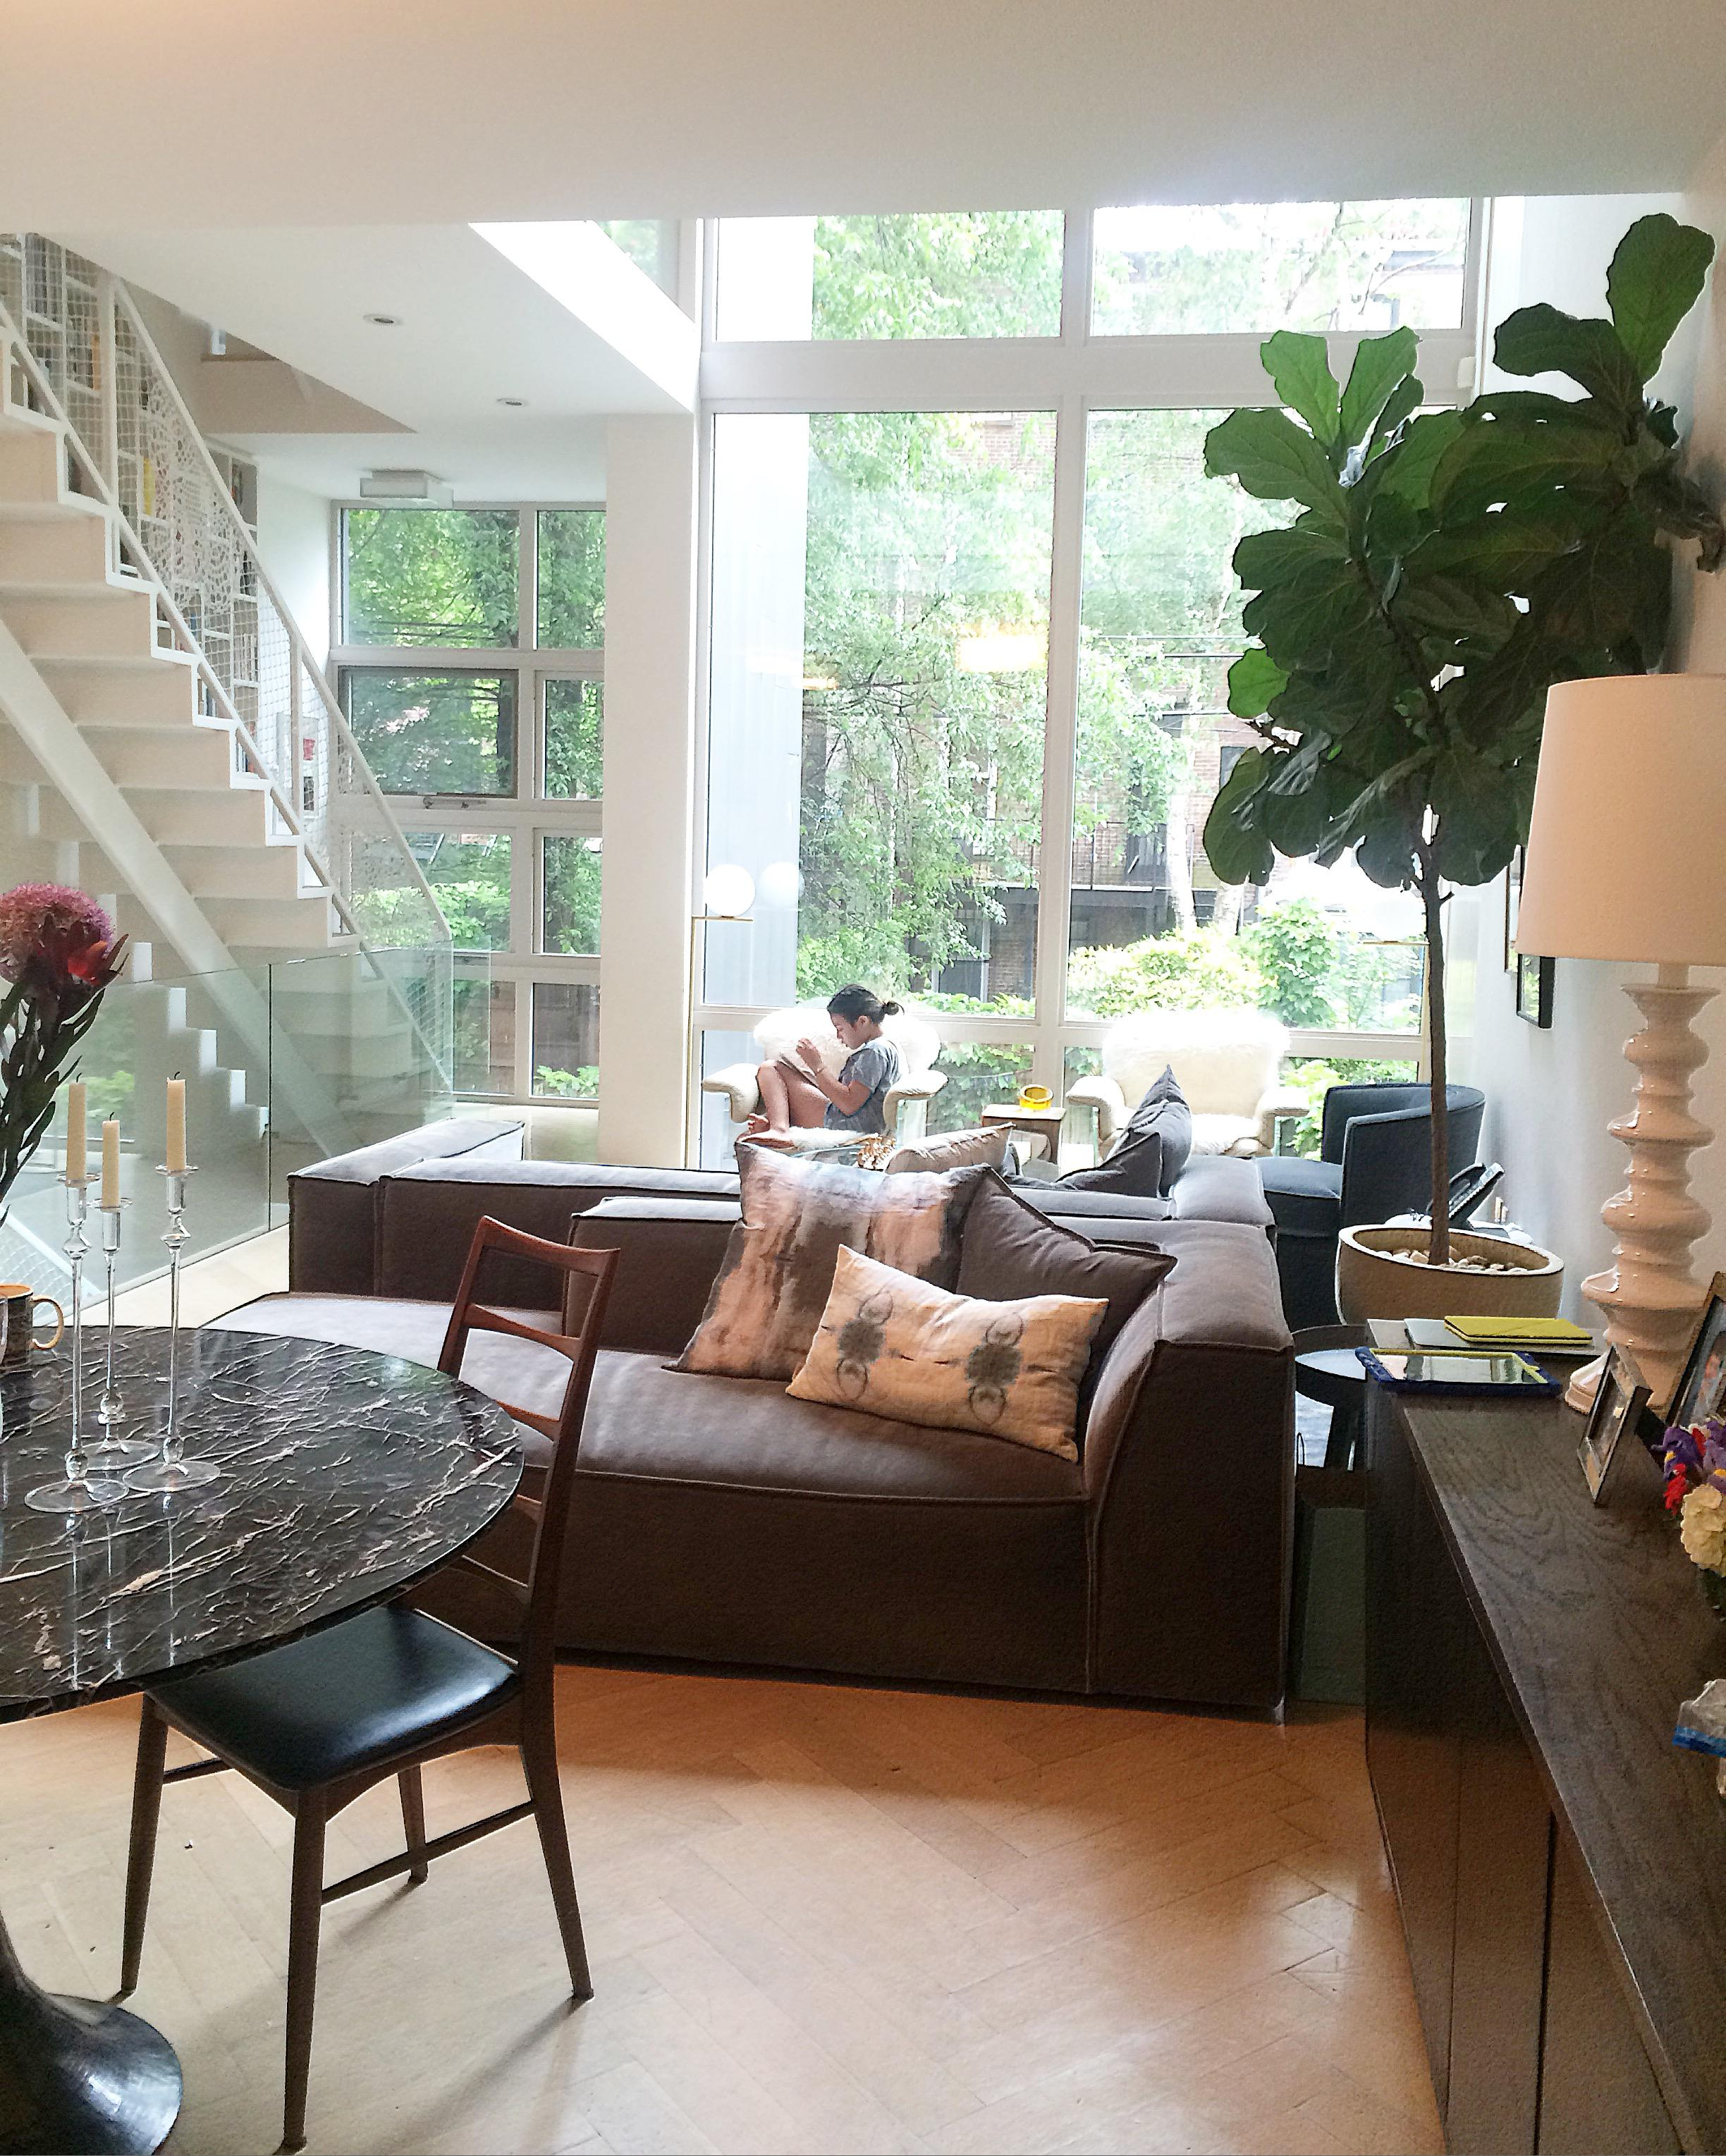 interior furniture house princeton nj blogs workanyware co uk u2022 rh blogs workanyware co uk